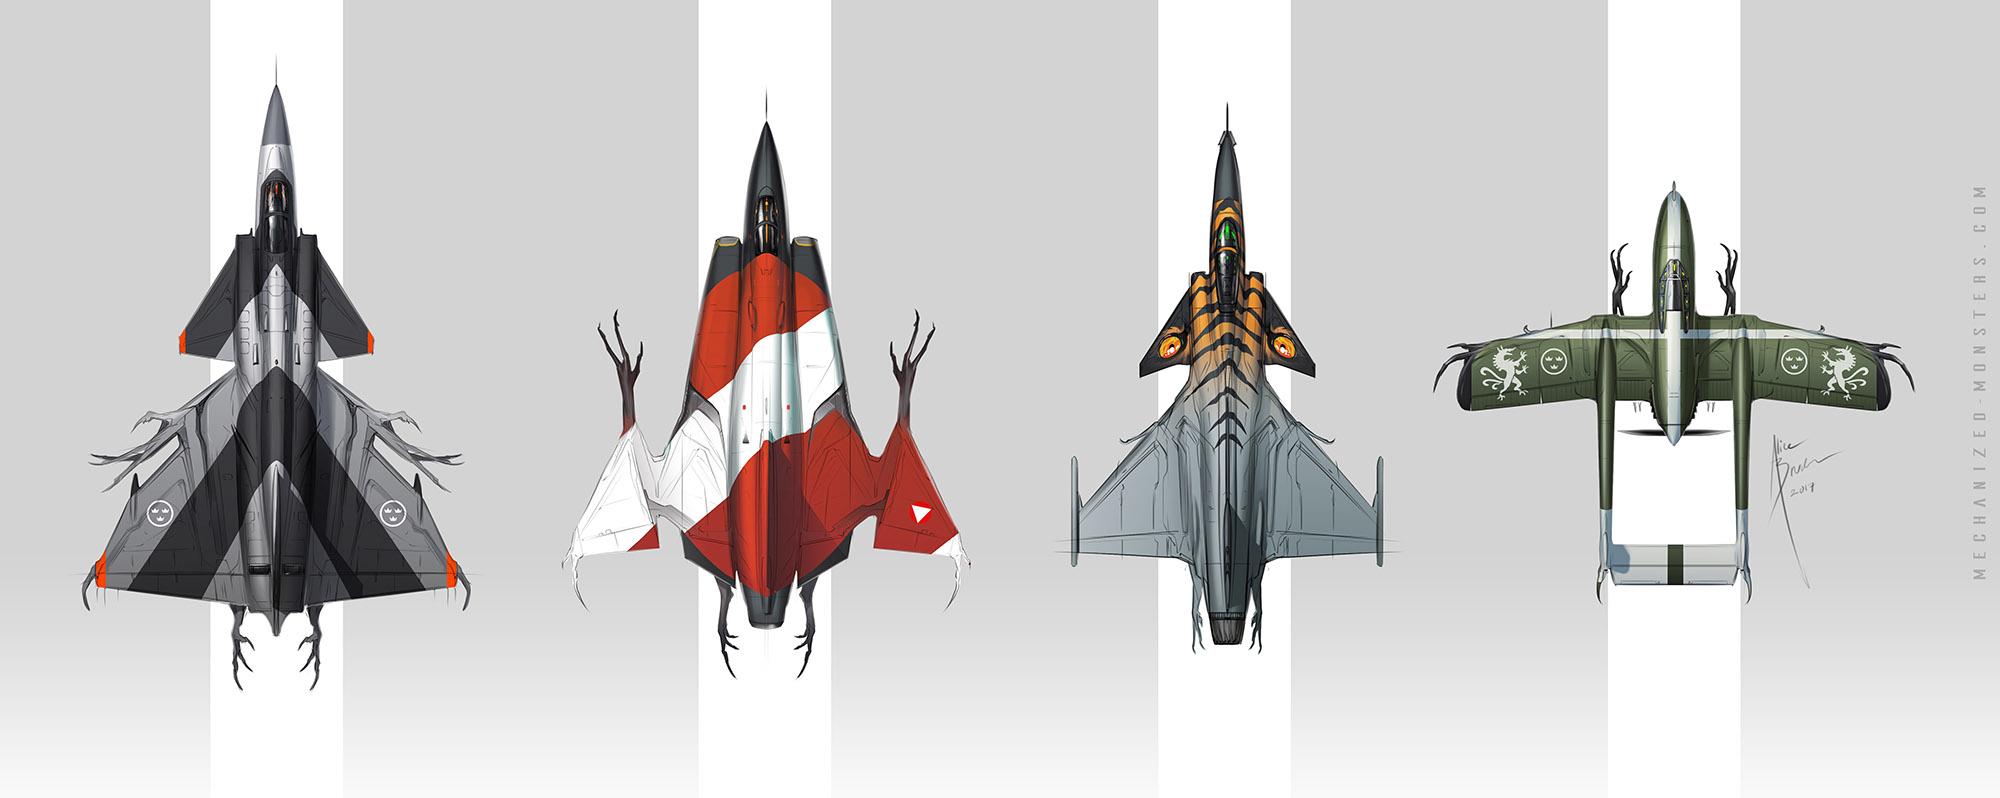 SAAB lineup by Hydrothrax